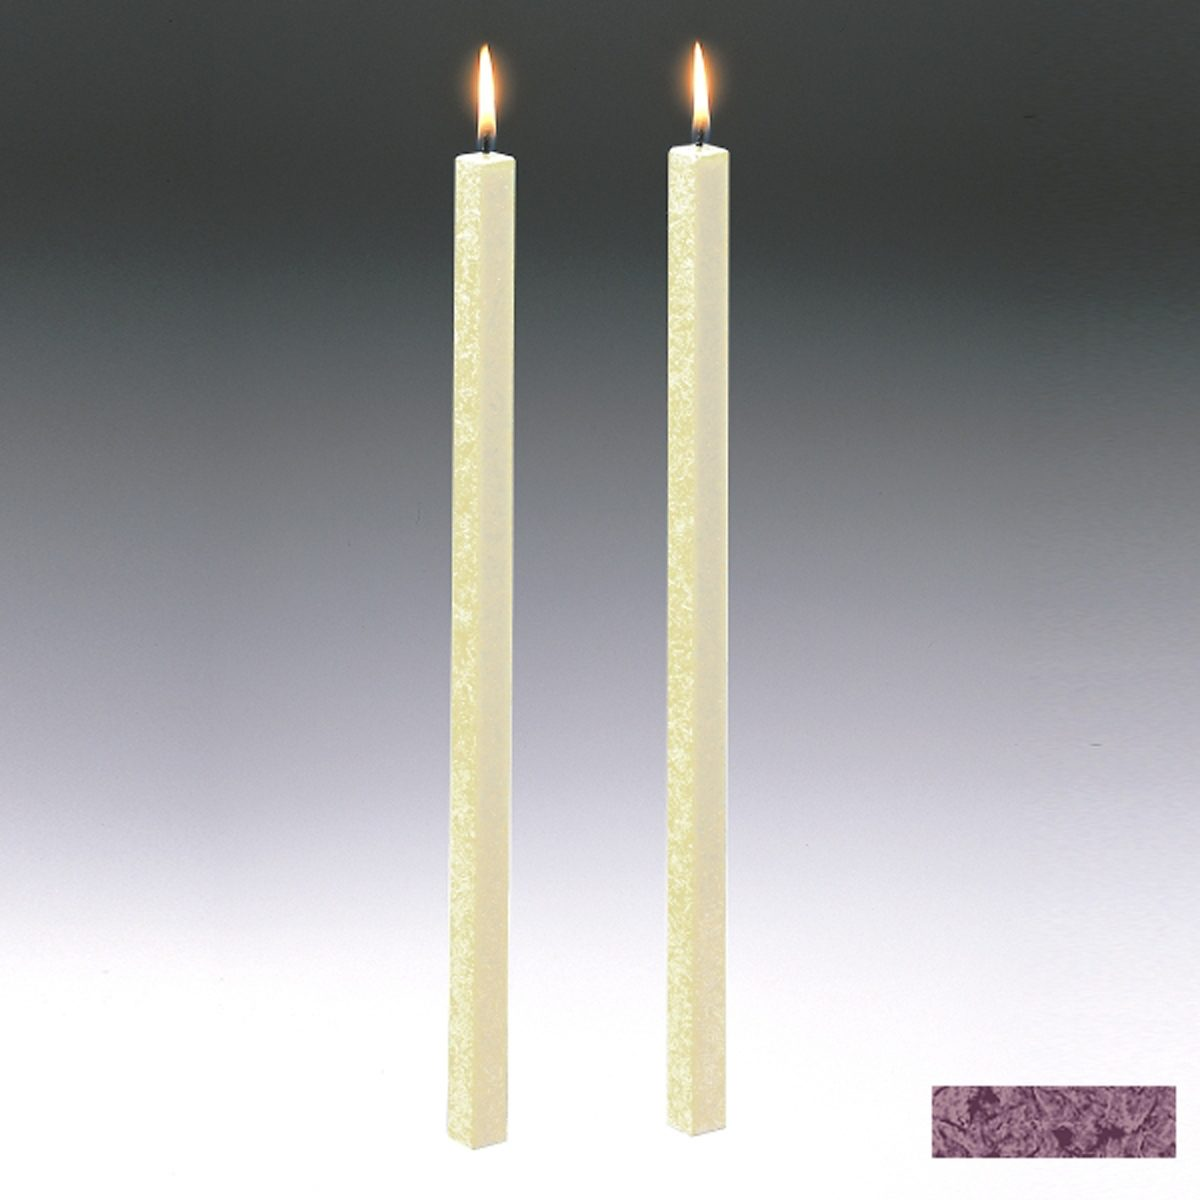 Amabiente Amabiente Kerze CLASSIC Burgund 40cm - 2er Set